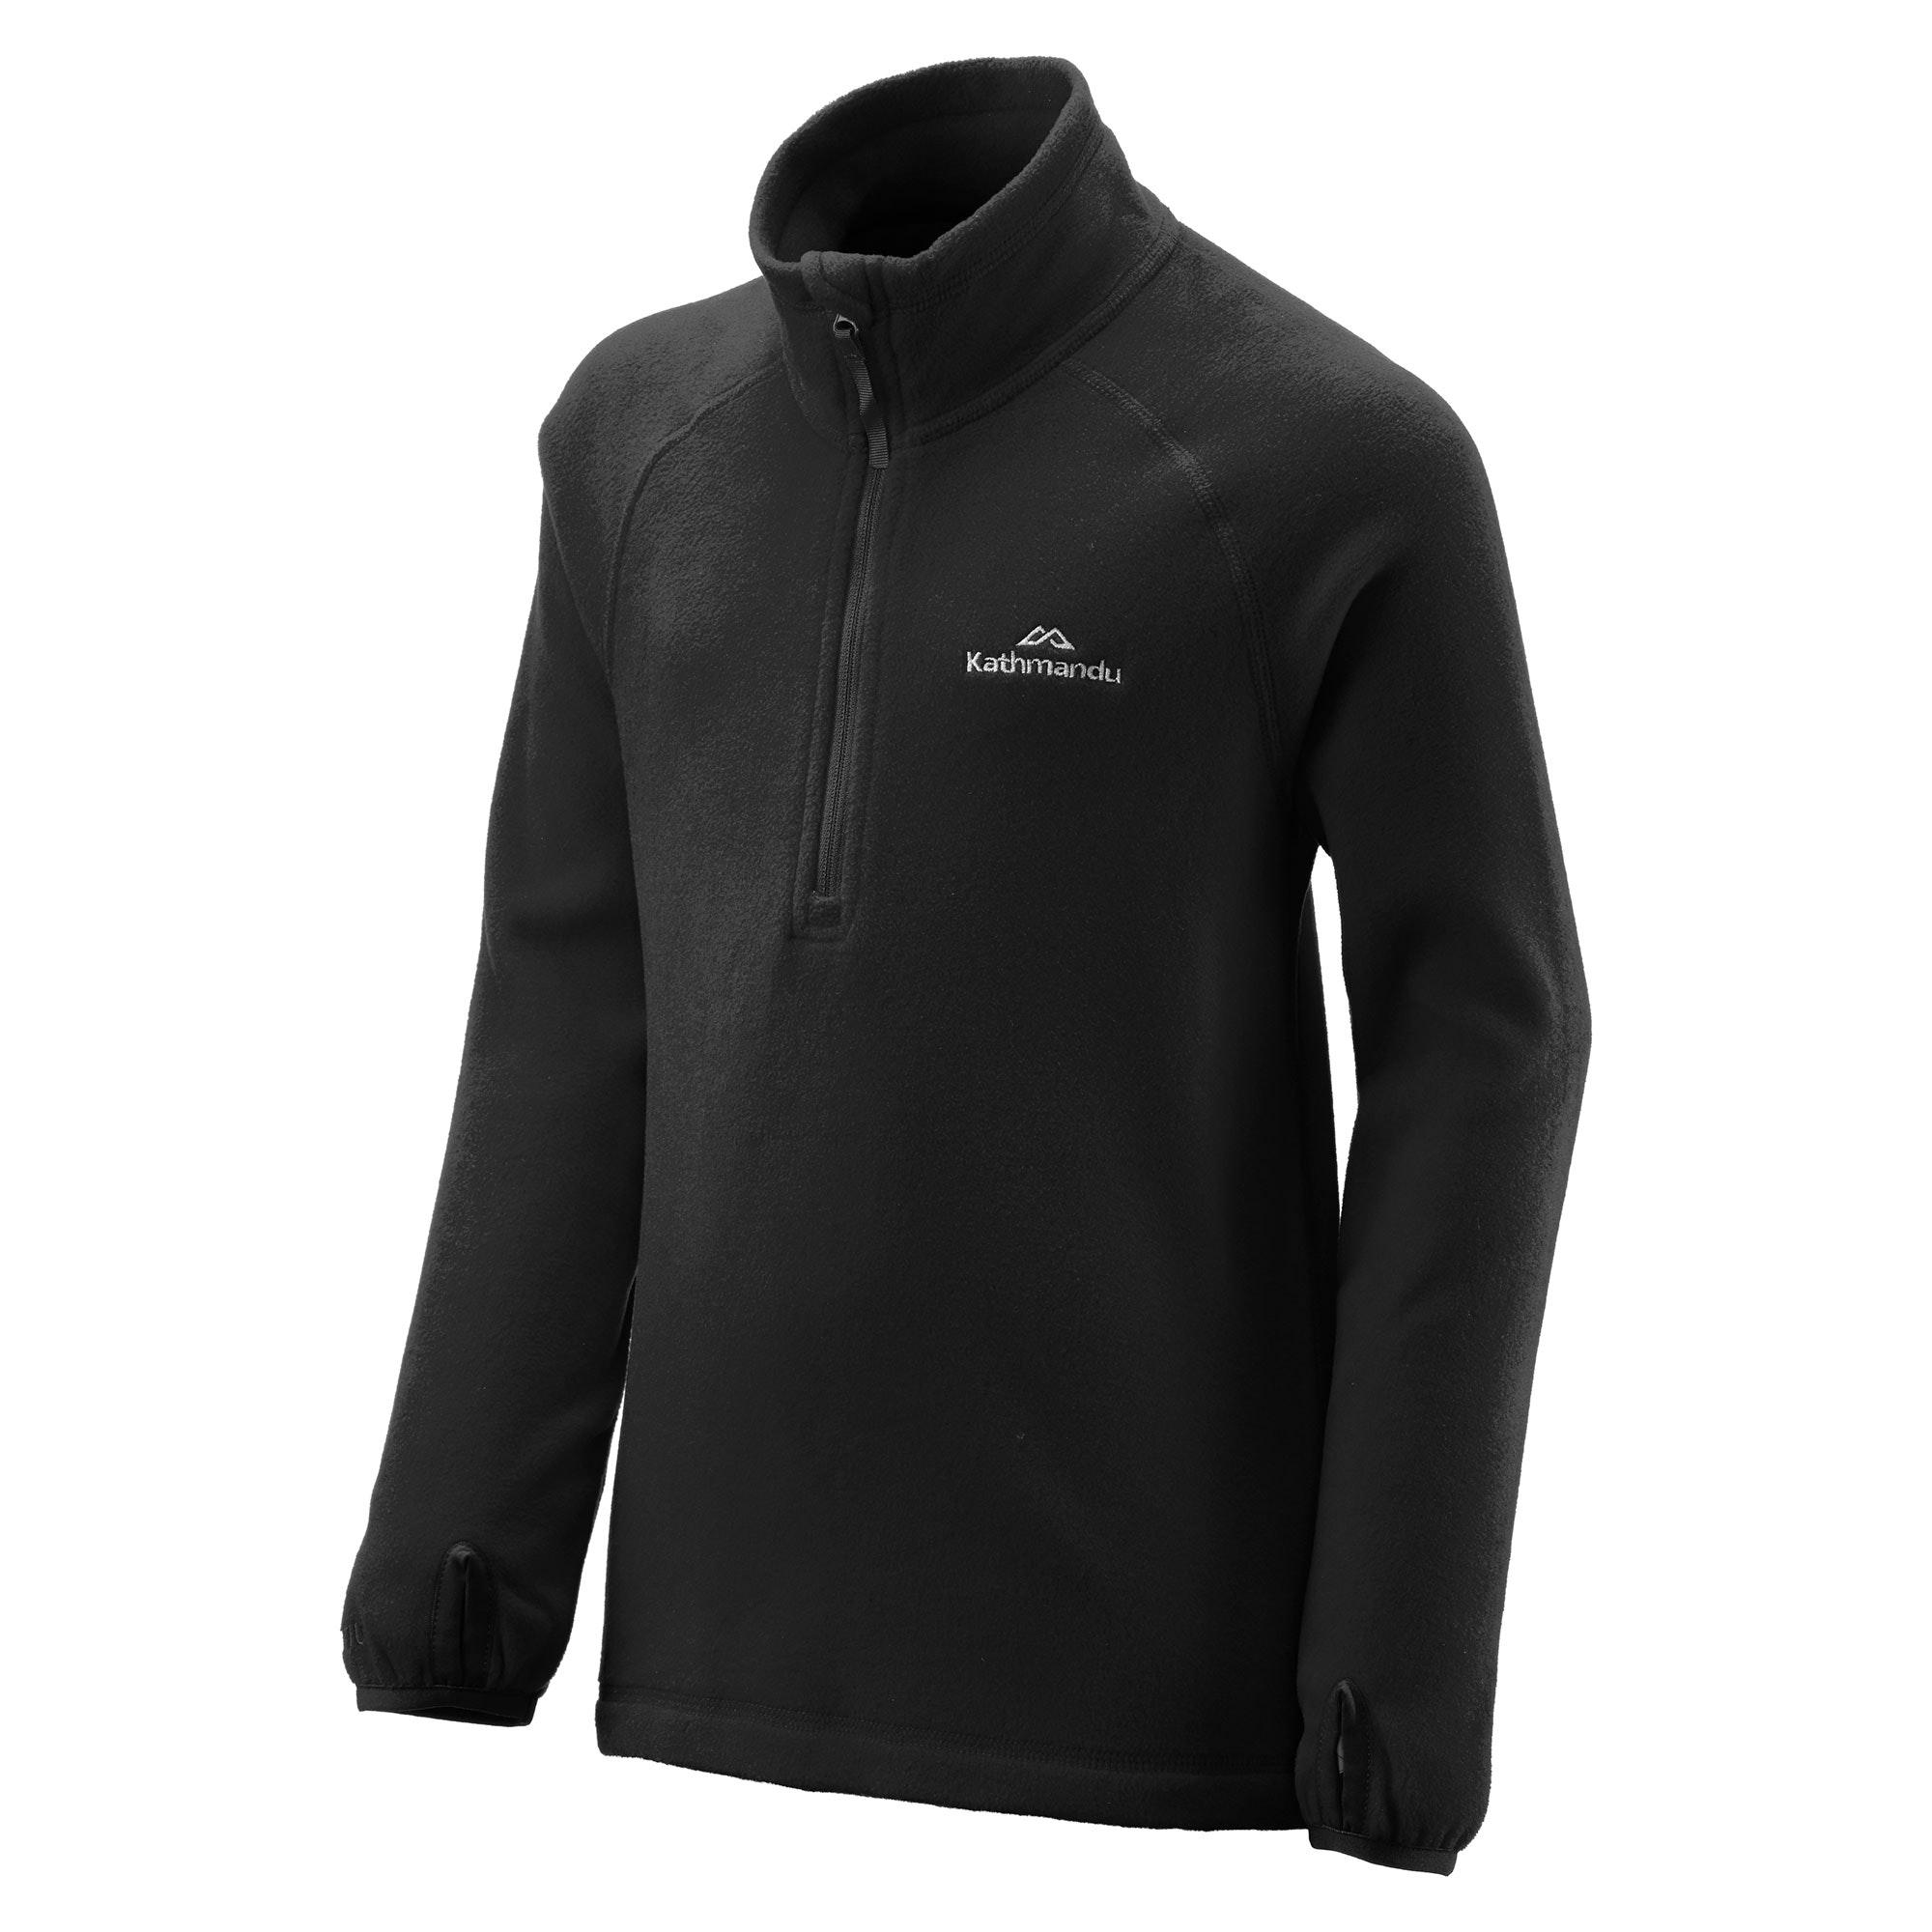 NEW-Kathmandu-Ridge-Kids-039-Girls-039-Boys-039-Warm-Fleece-Jacket-1-4-Zip-Pullover-Top thumbnail 13